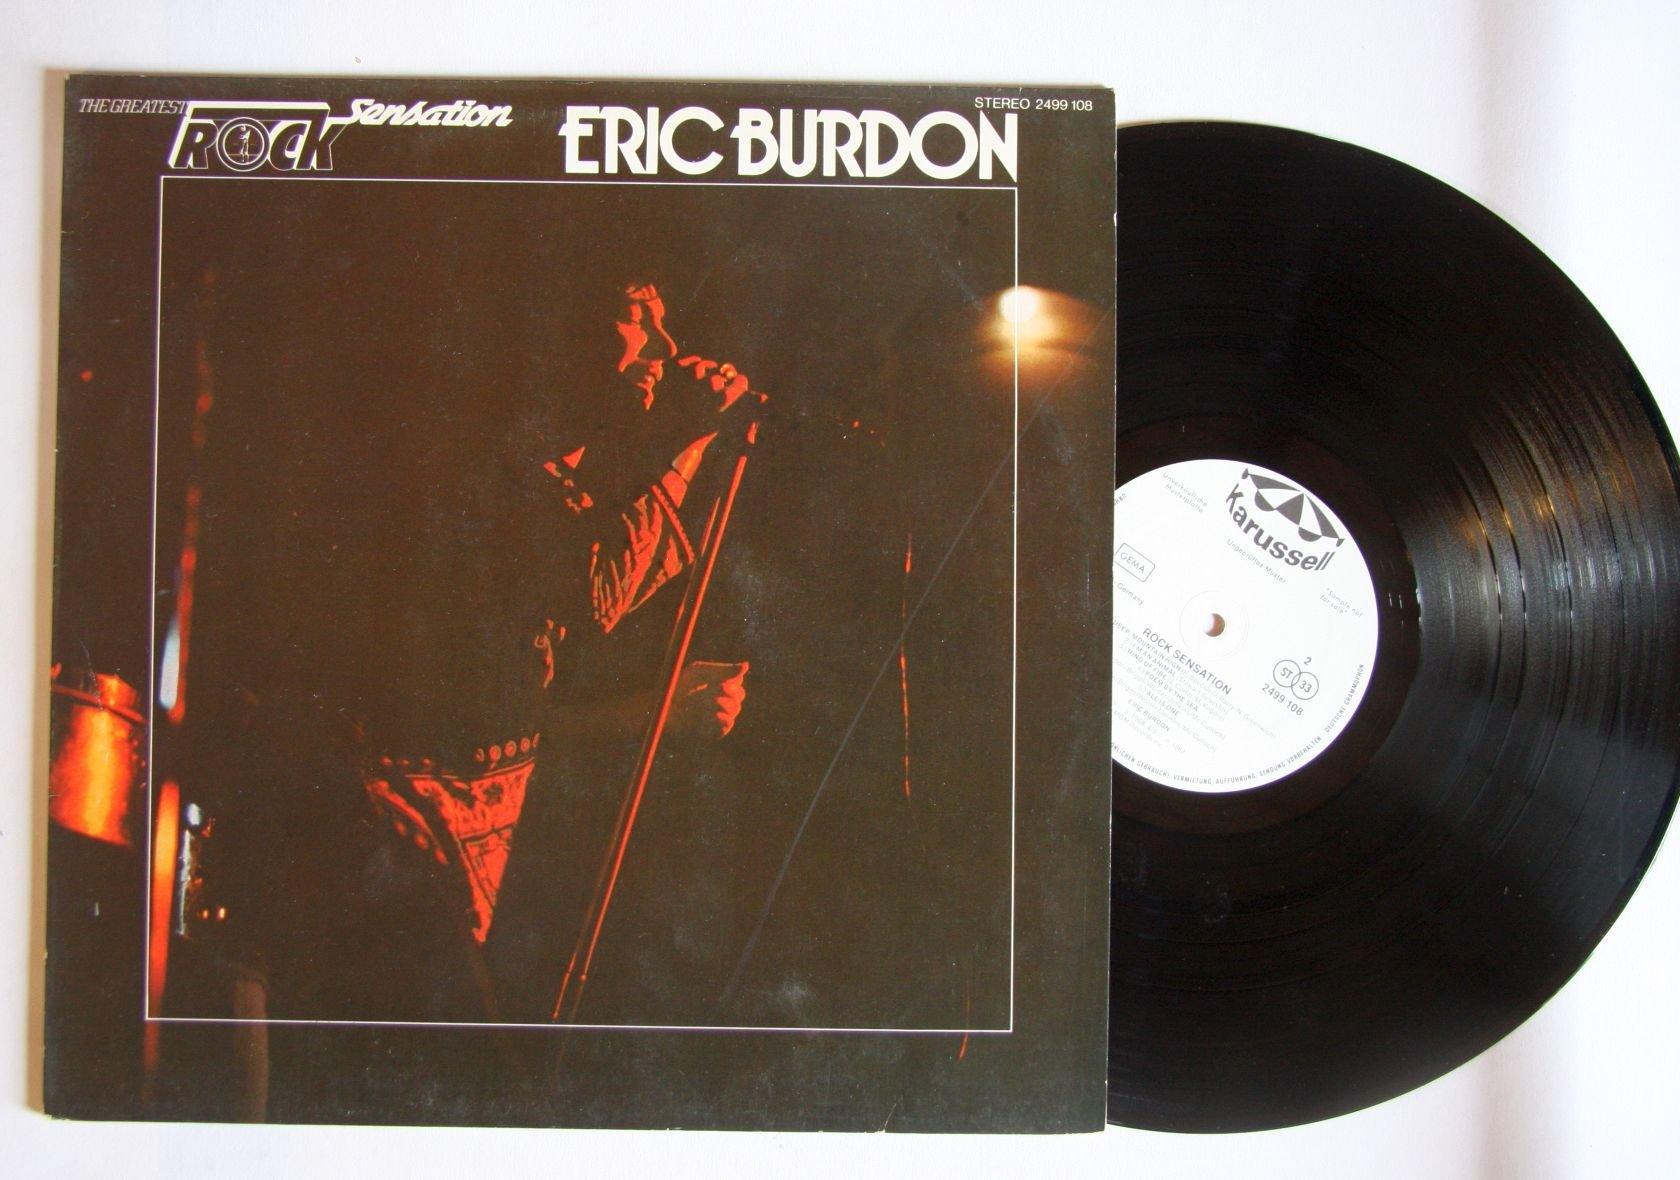 The Greatest Rock Sensation - Eric Burdon